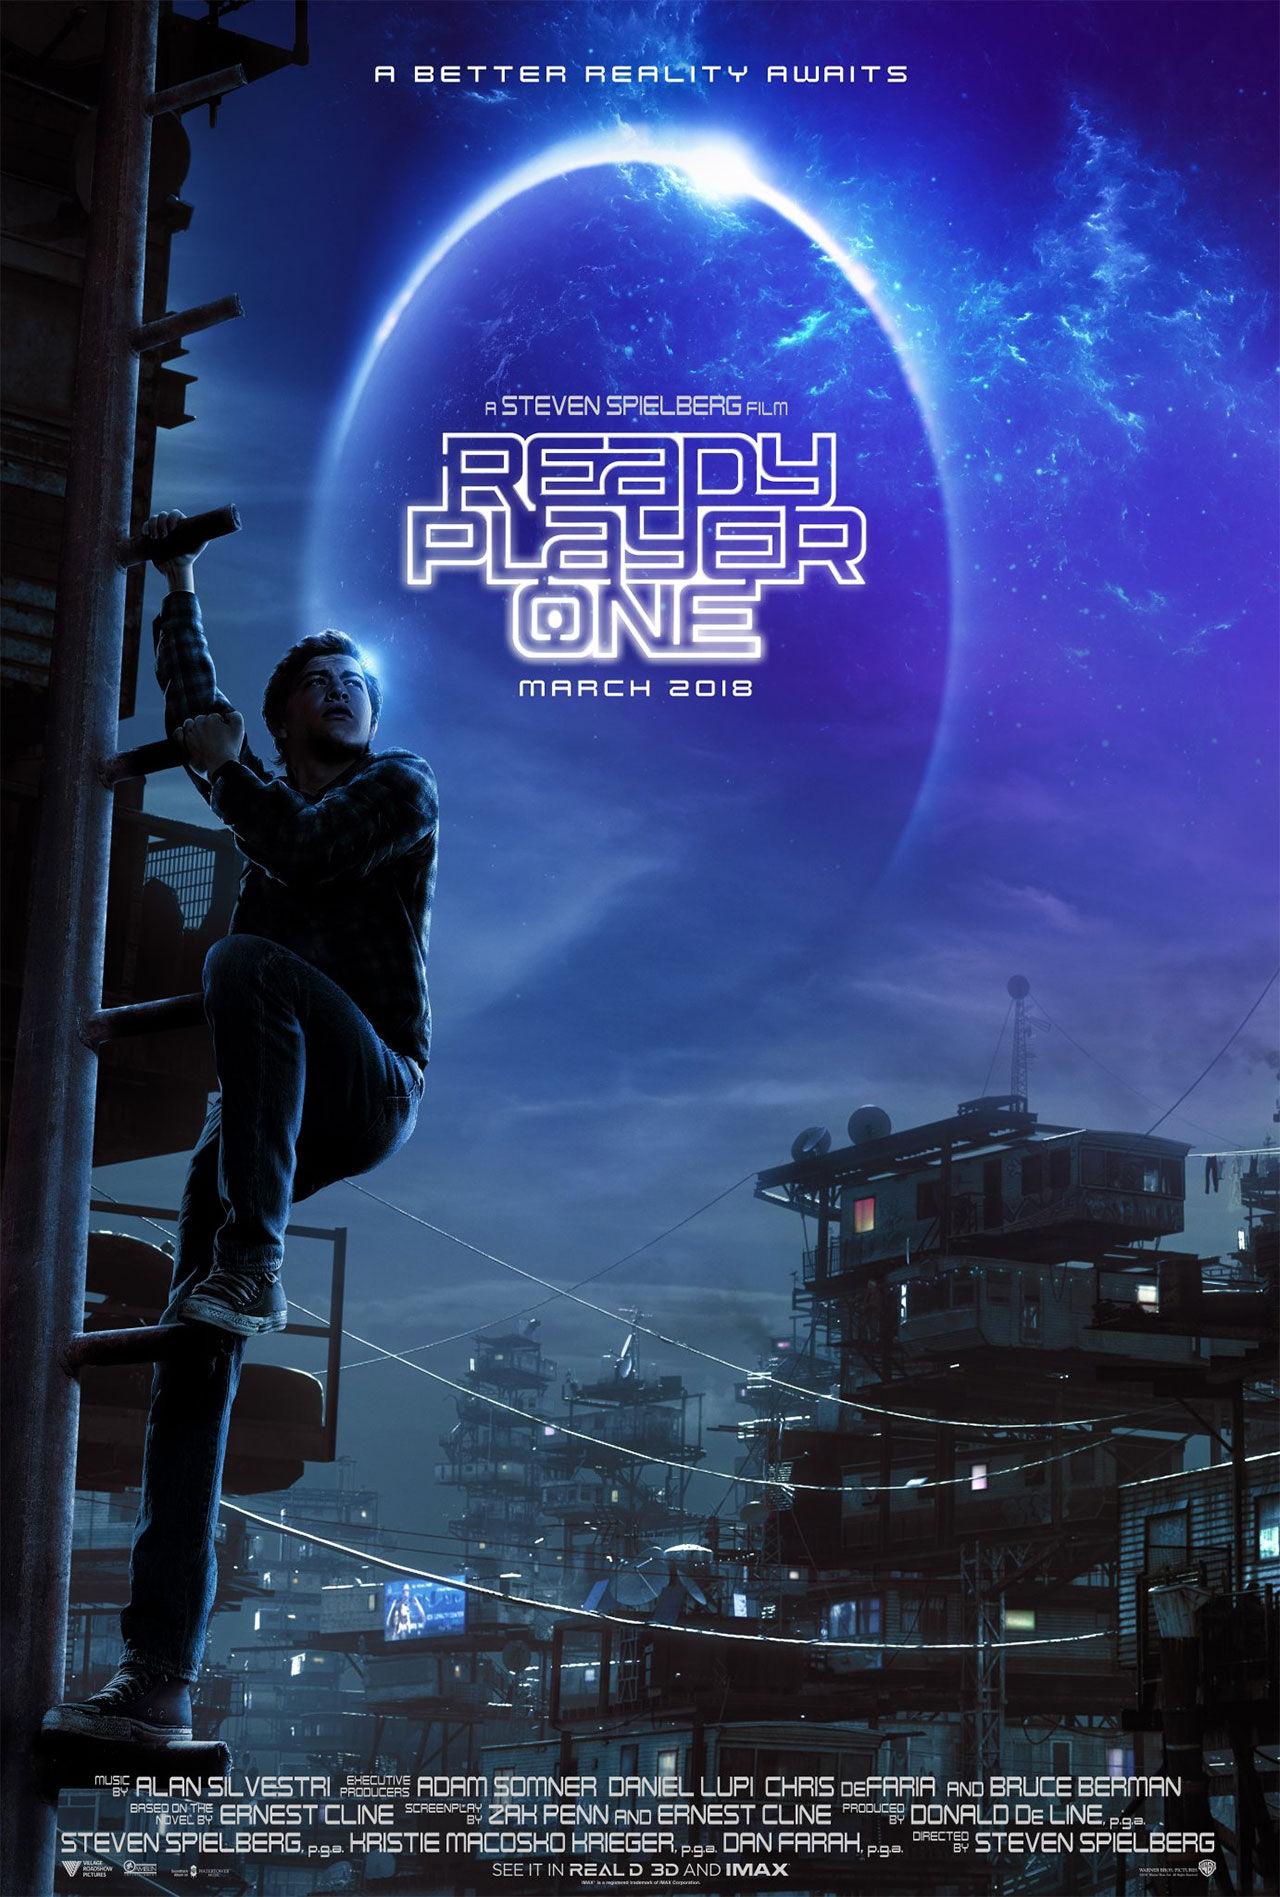 Poster för Spielberg-rullen Ready Player One